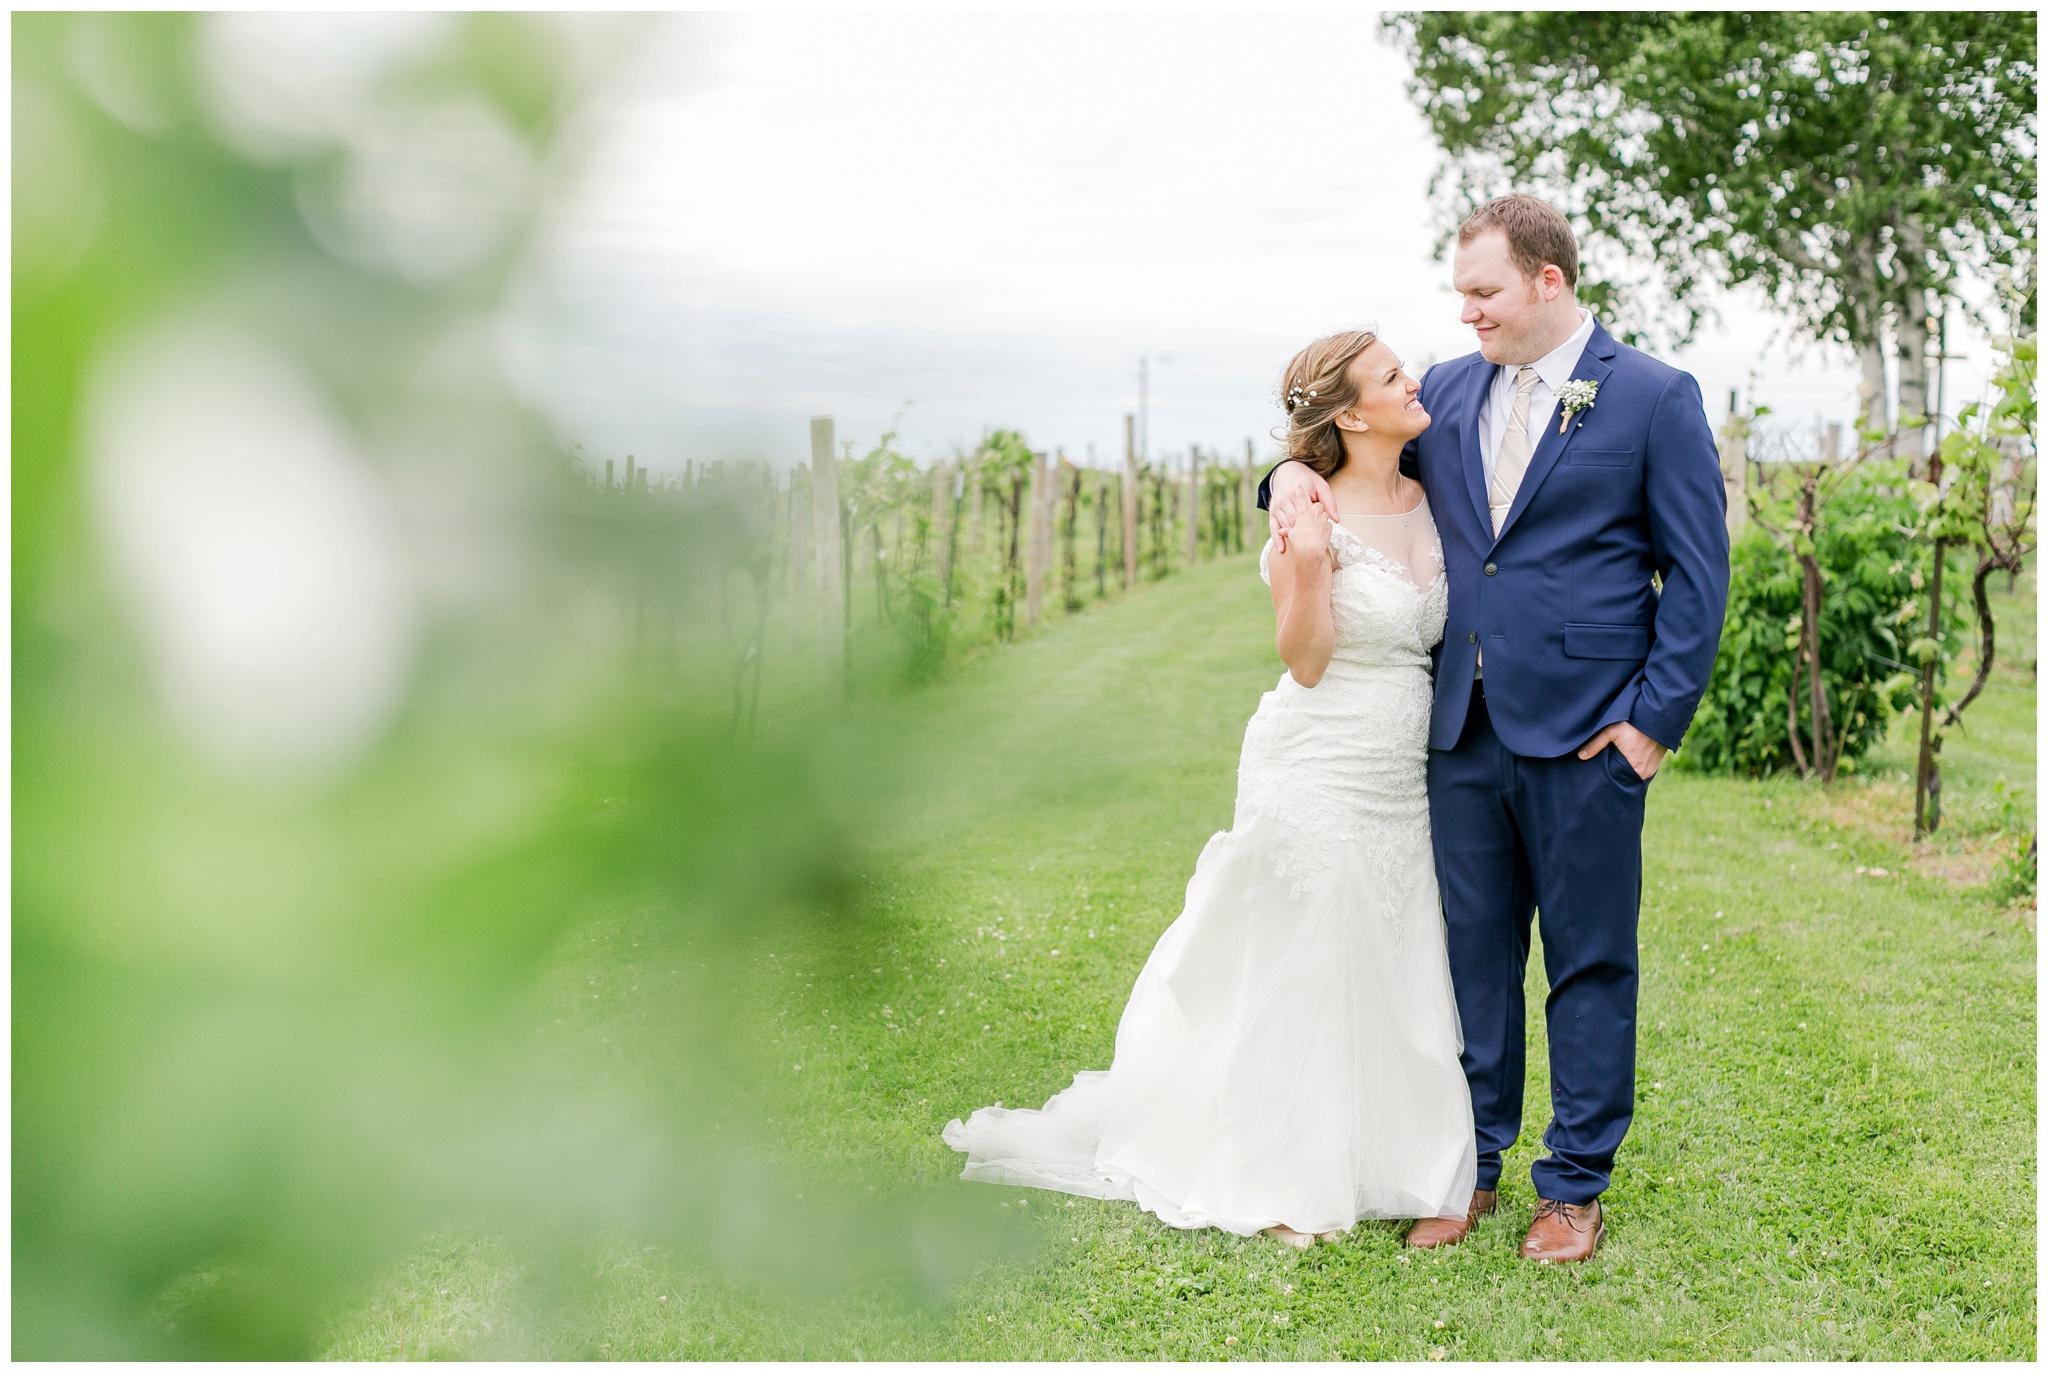 over_the_vines_wedding_edgerton_wisconsin_wedding_caynay_photo_4009.jpg